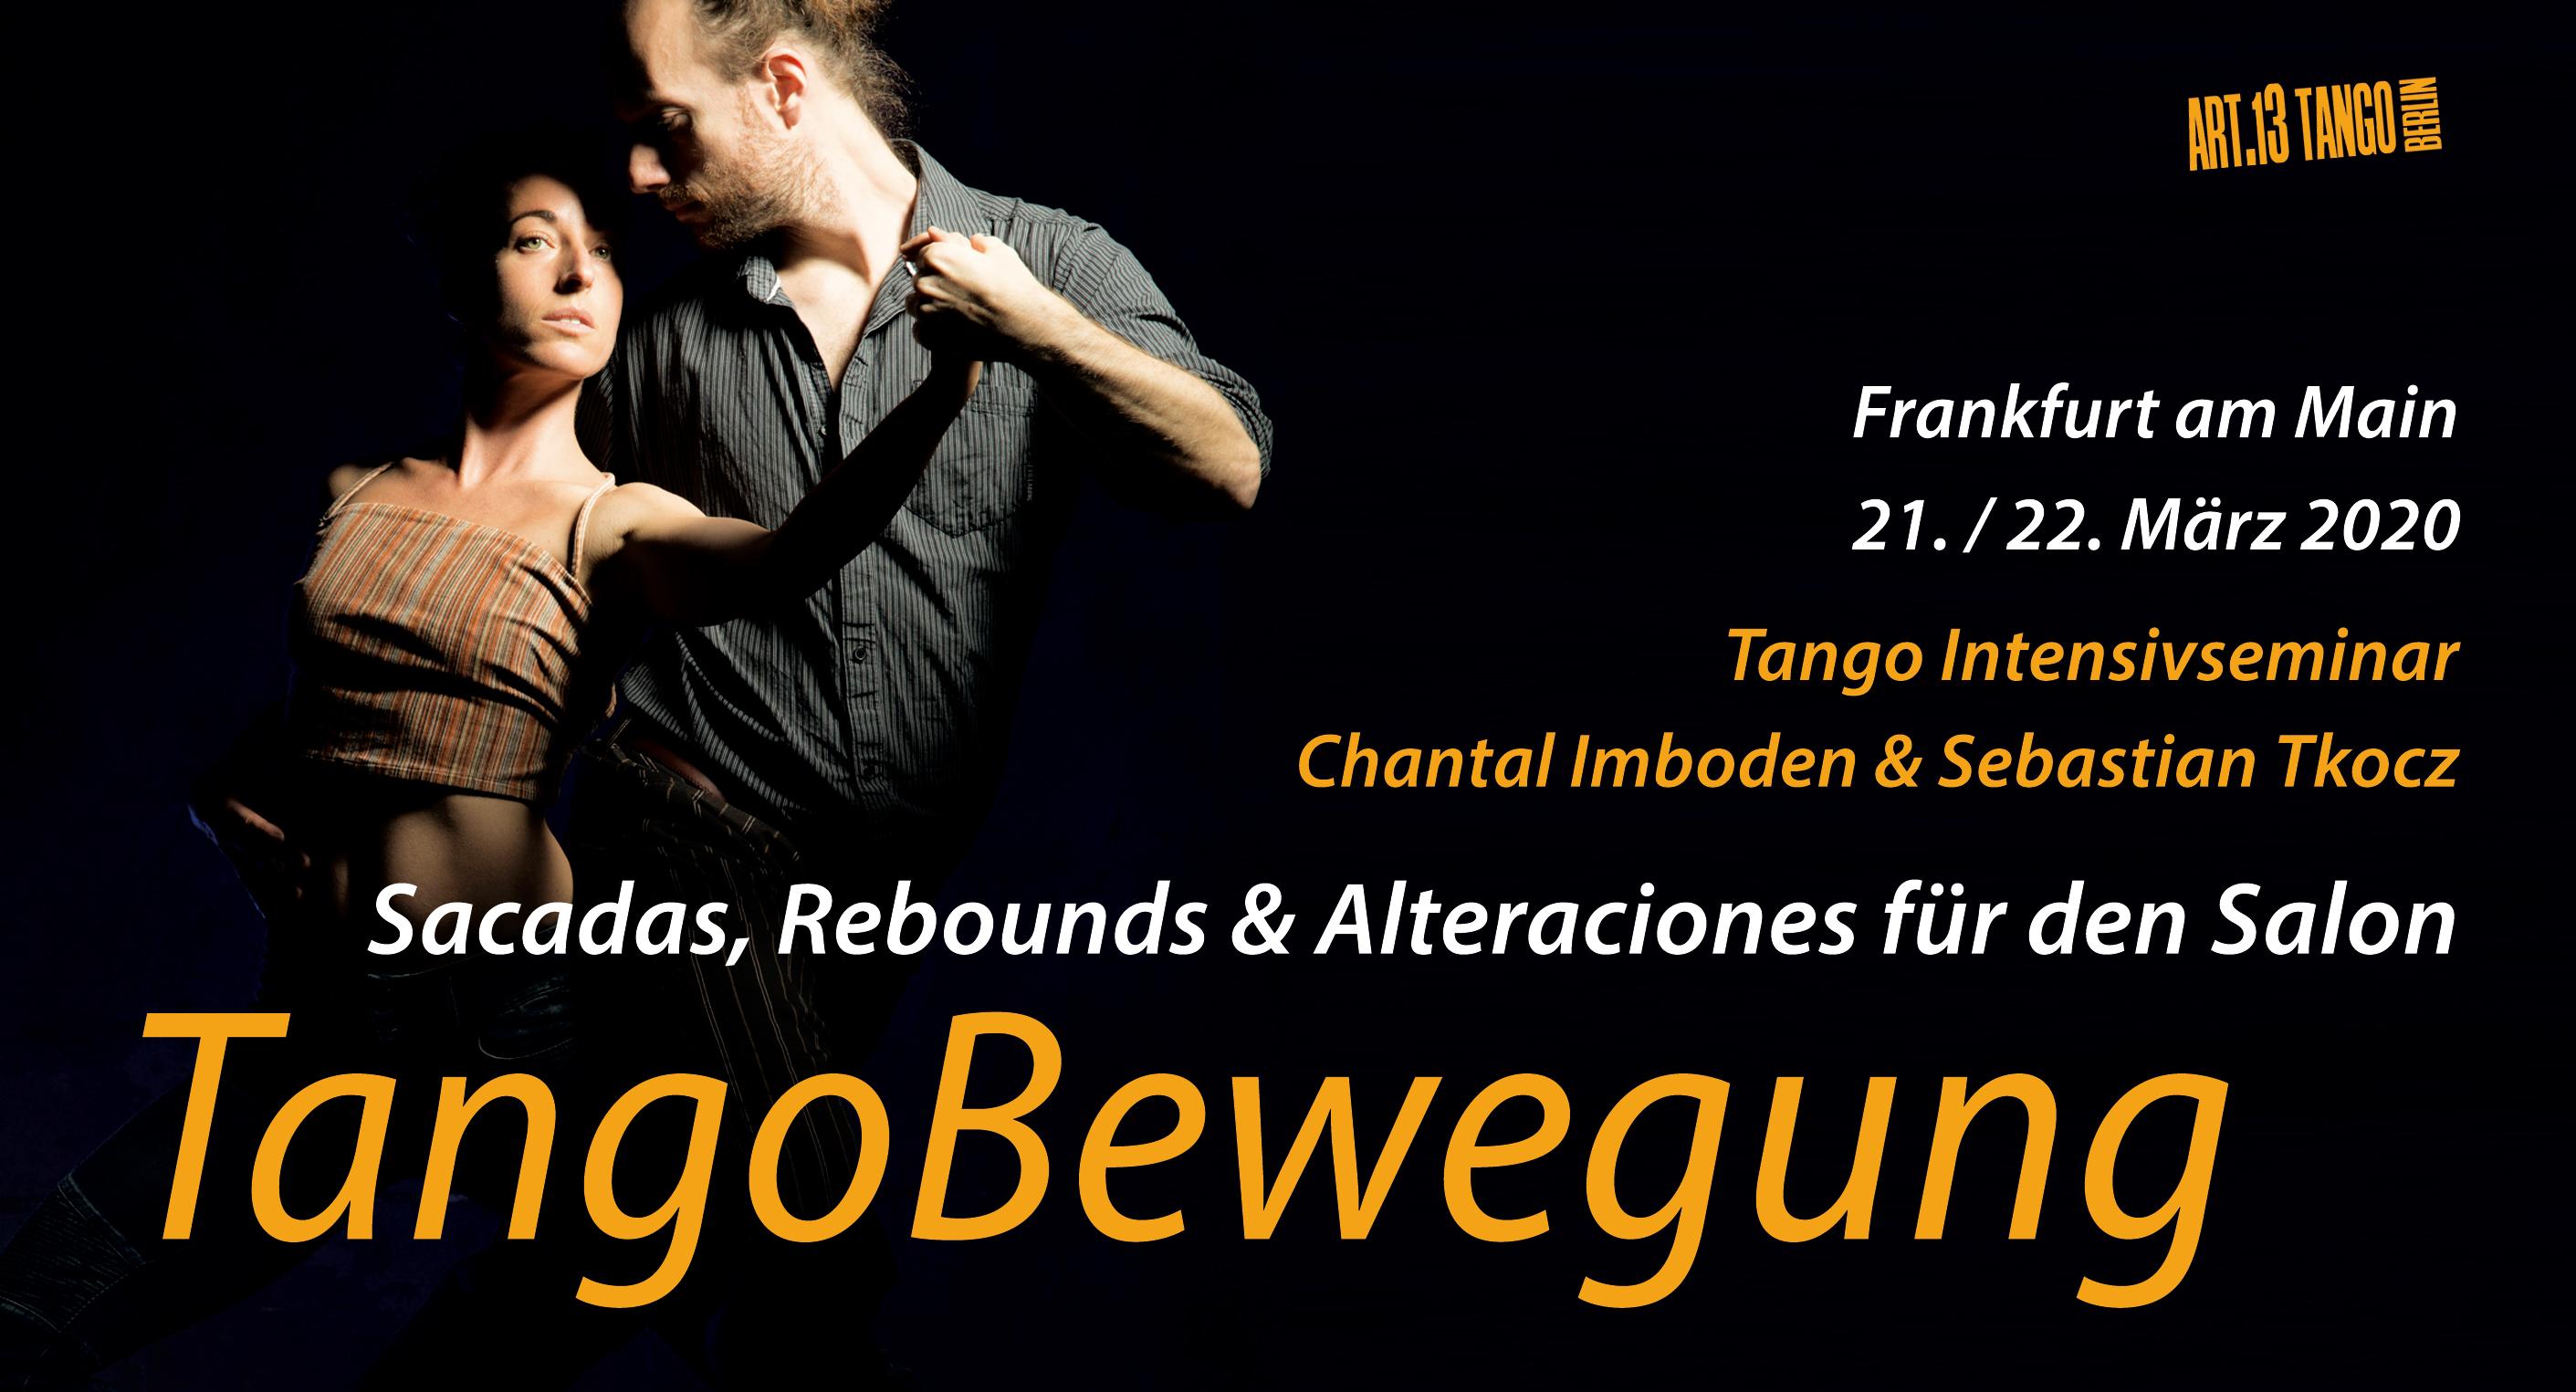 Tangobewegung Frankfurt